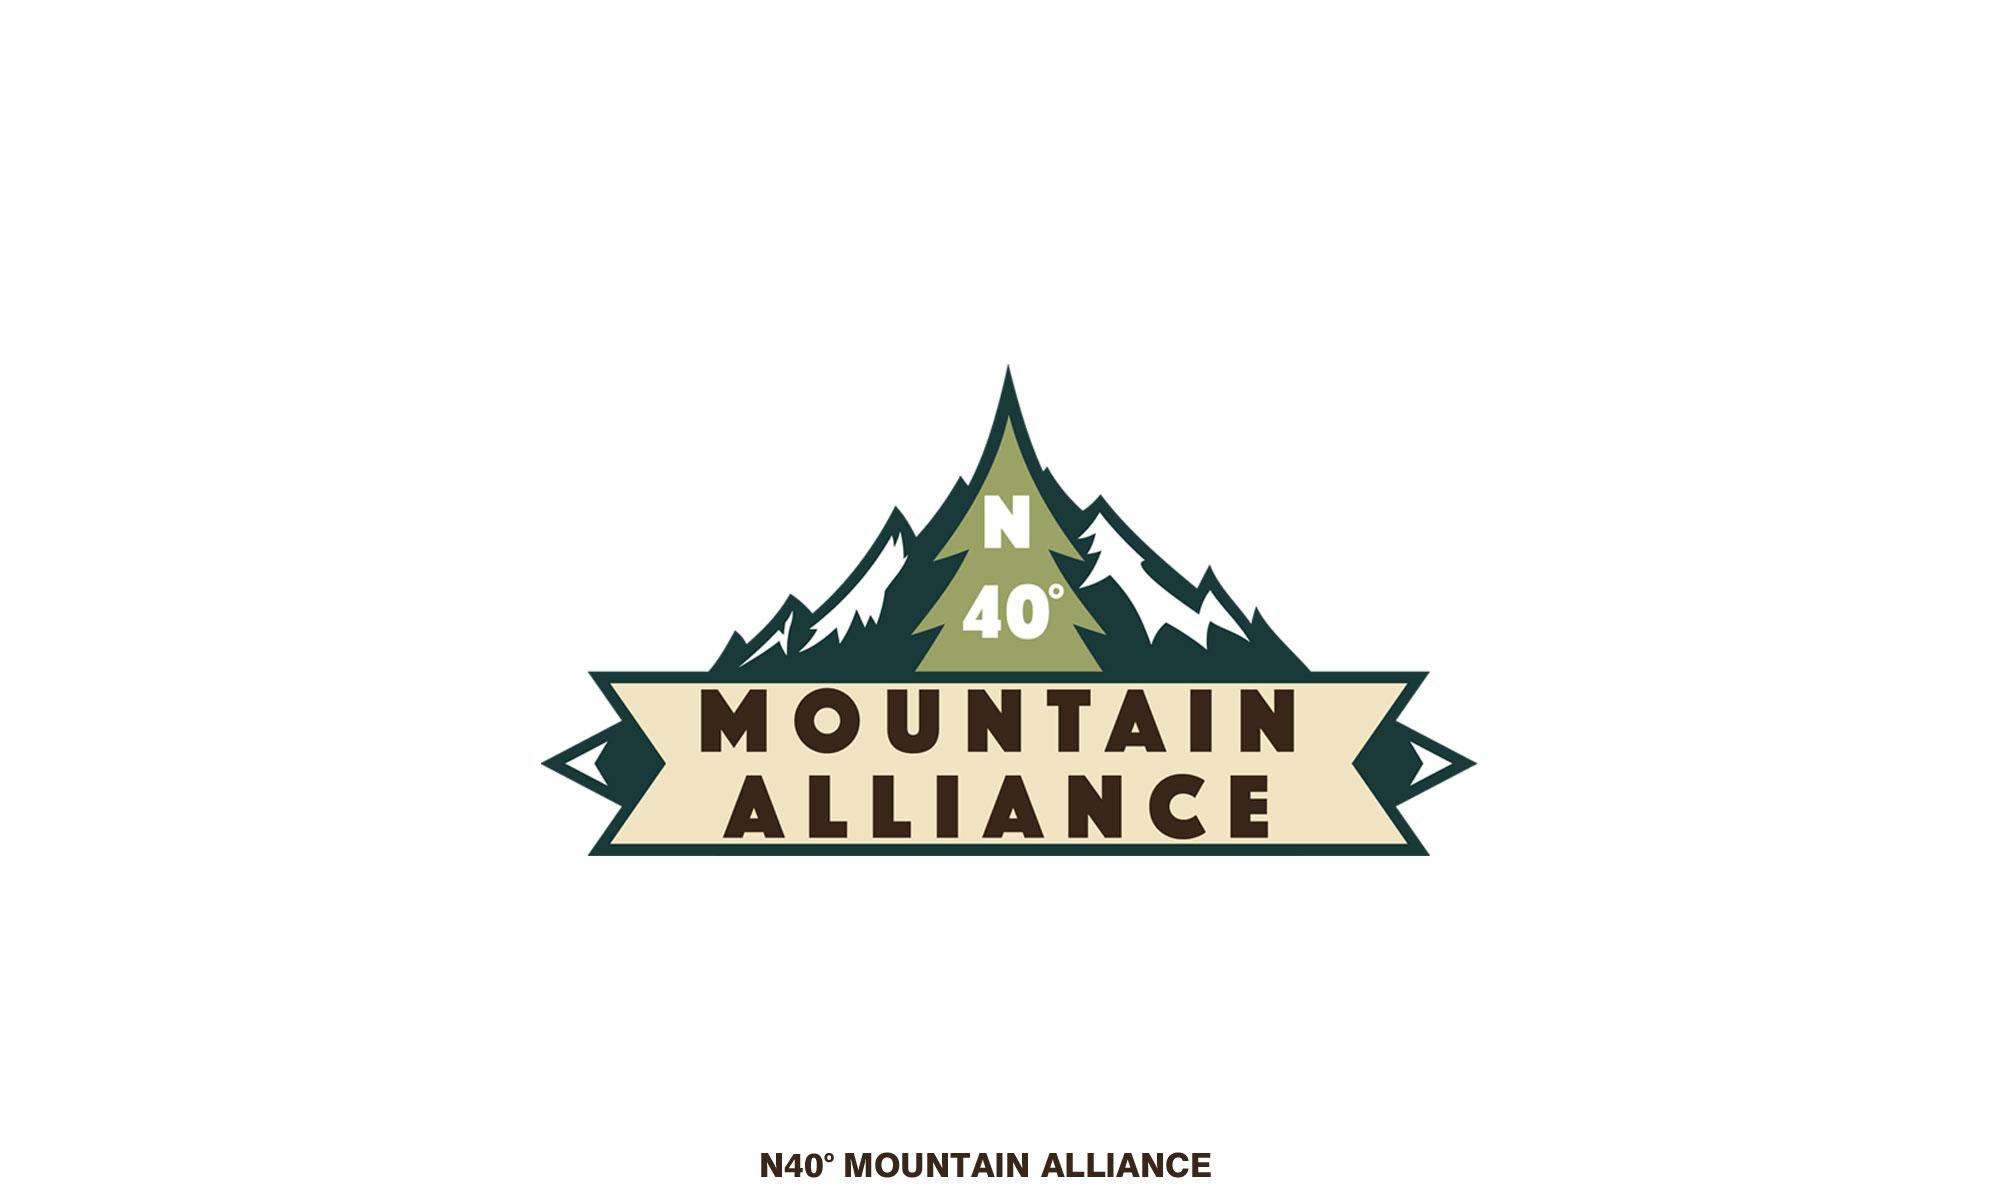 N-40 Mountain Alliance